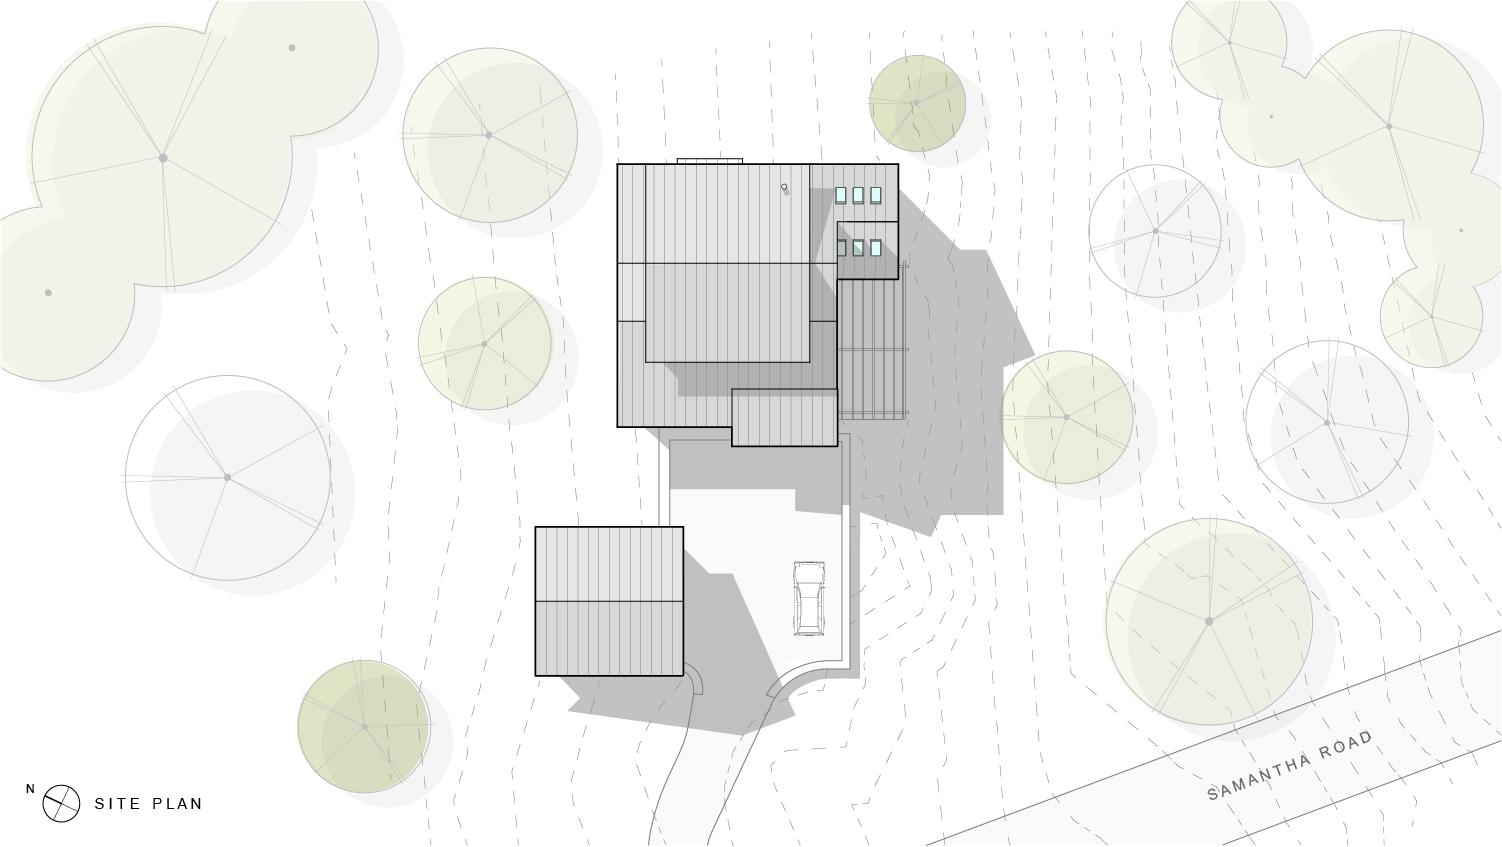 sagamore-estates-site-plan